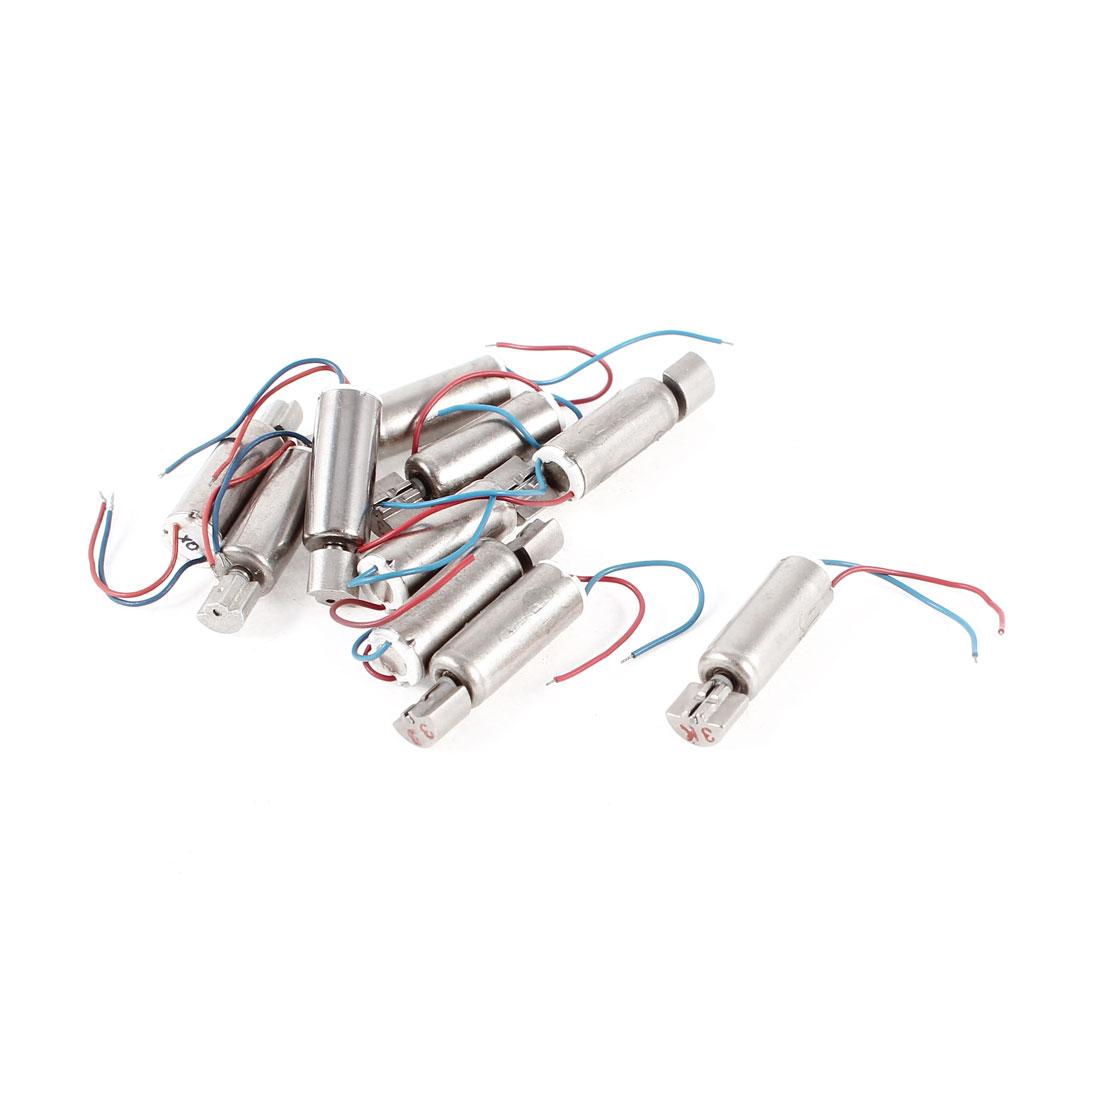 10pcs Miniature Vibration Motor DC 3V 3500RPM for Phones Pagers Robotics Control Sticks